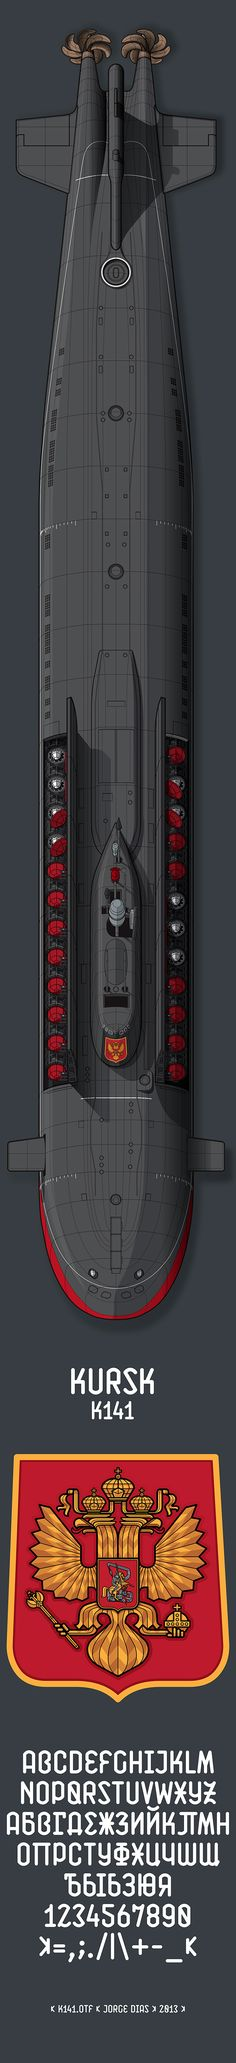 Submarine Kursk Typeface Project